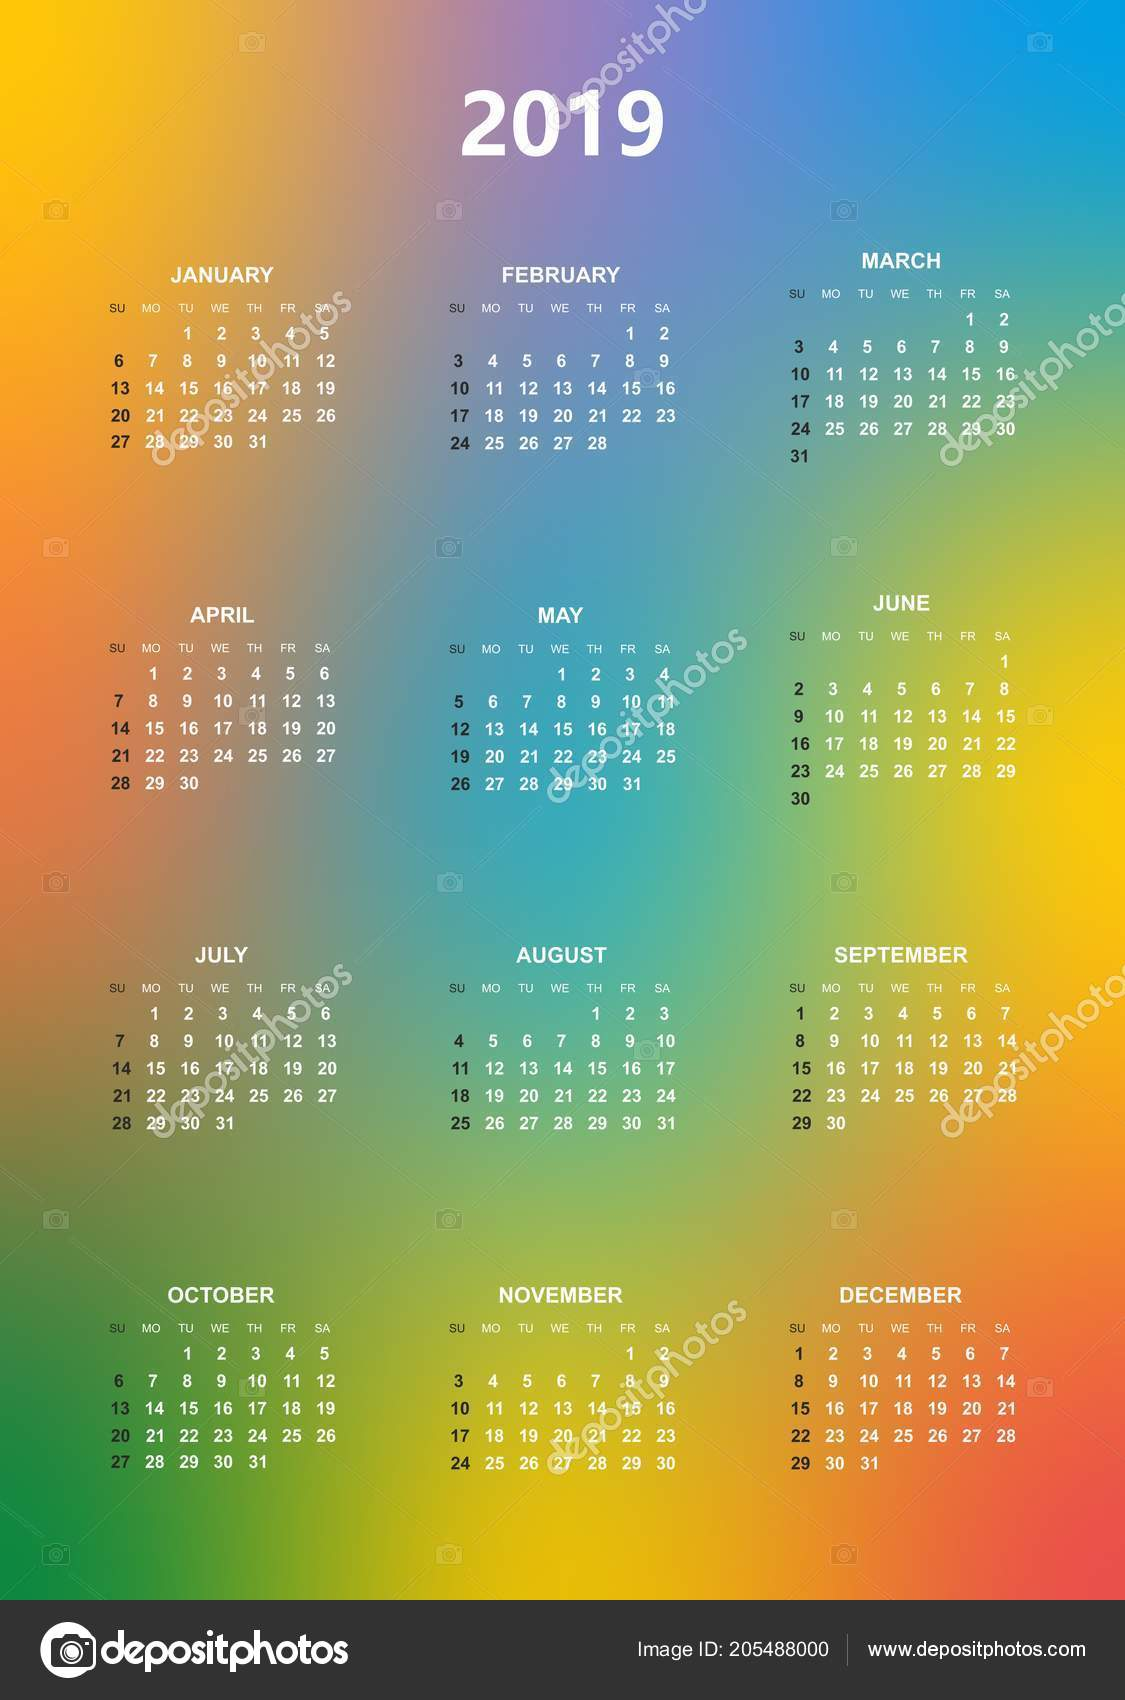 Simple Color Calendar Year 2019 Names Days Months Row Sunday — Stock